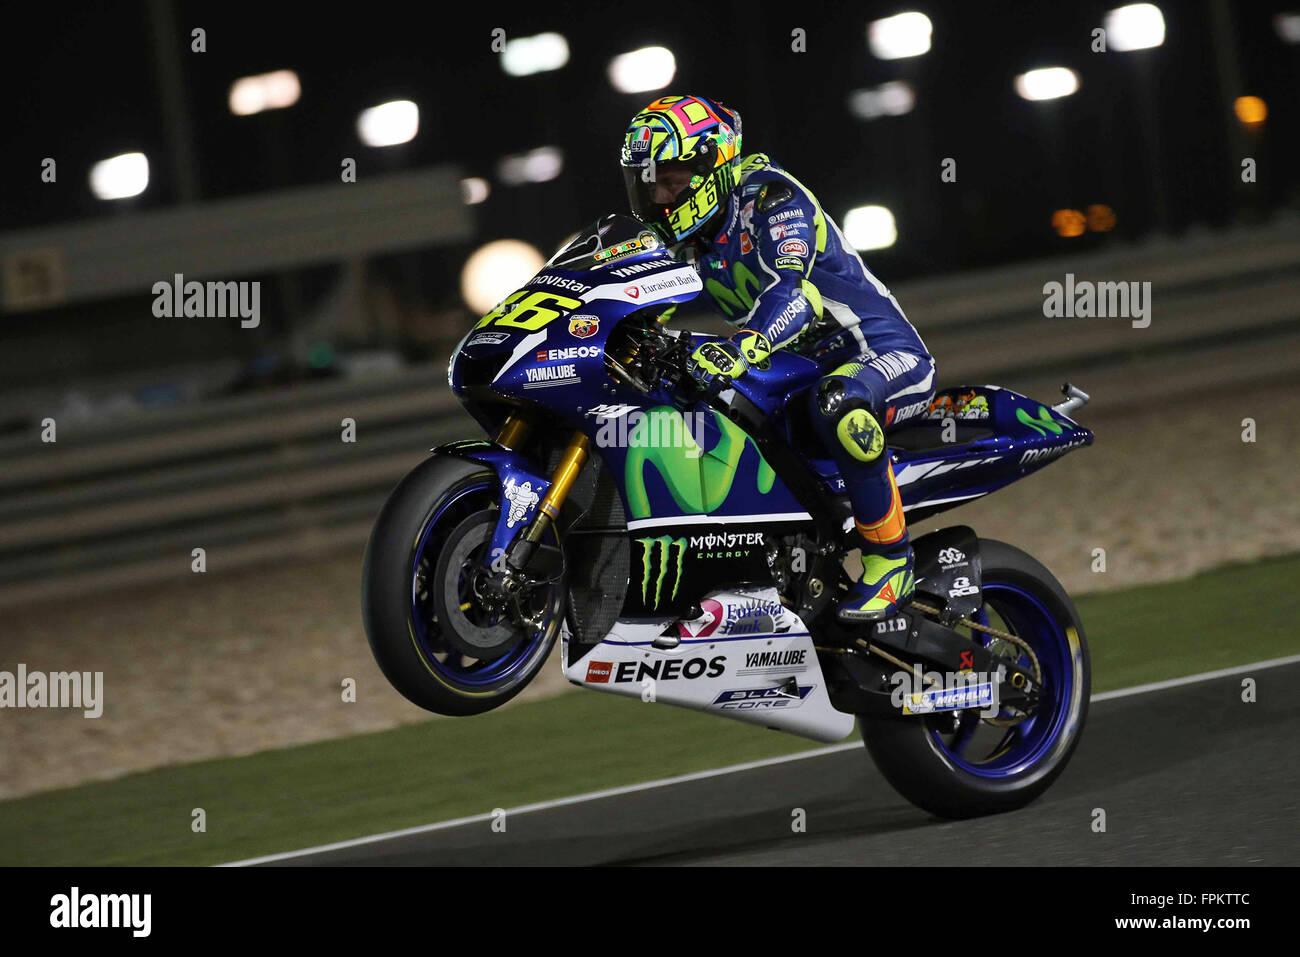 Doha, Qatar. 18th March, 2016. Valentino Rossi of Italy and Yamaha Stock Photo, Royalty Free ...